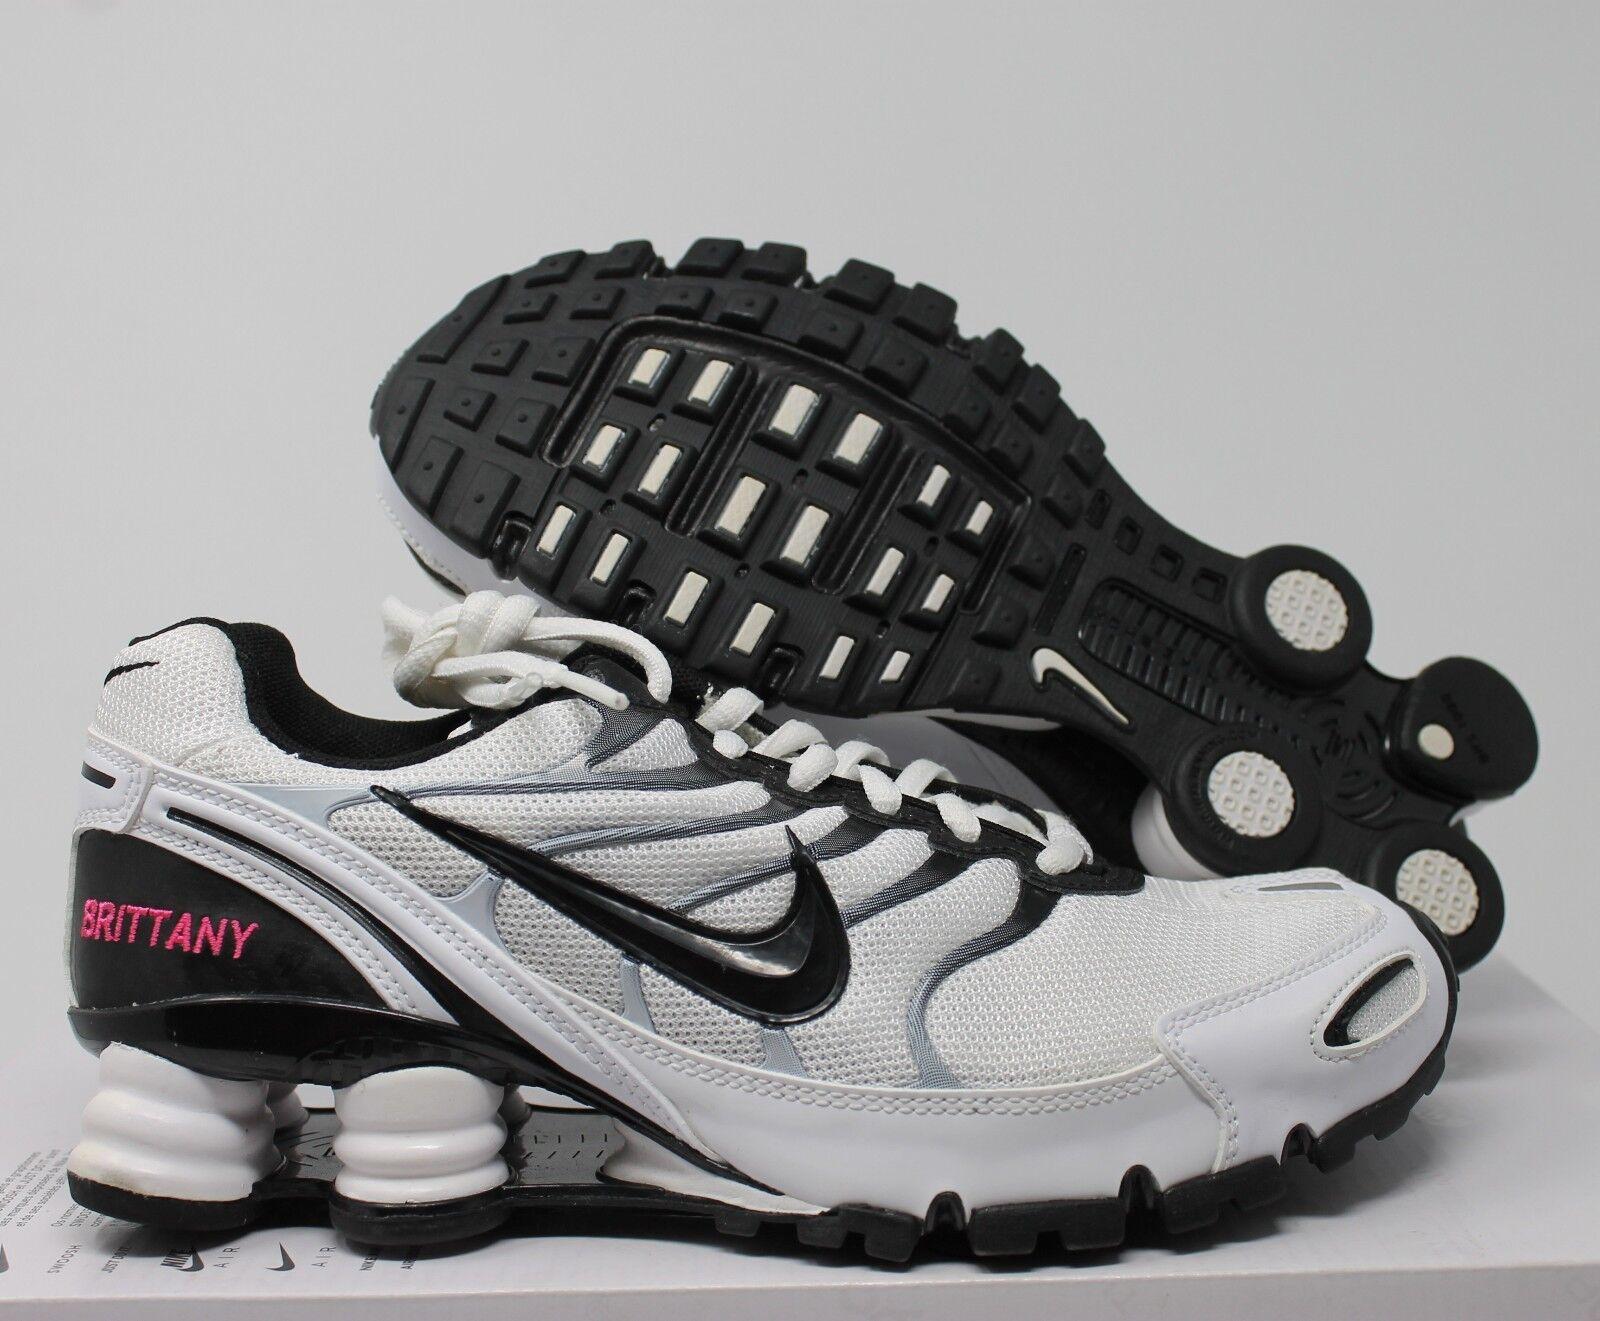 Nike Women's  Shox Turbo+ VI iD White-Black SZ 6.5 [326907-992]